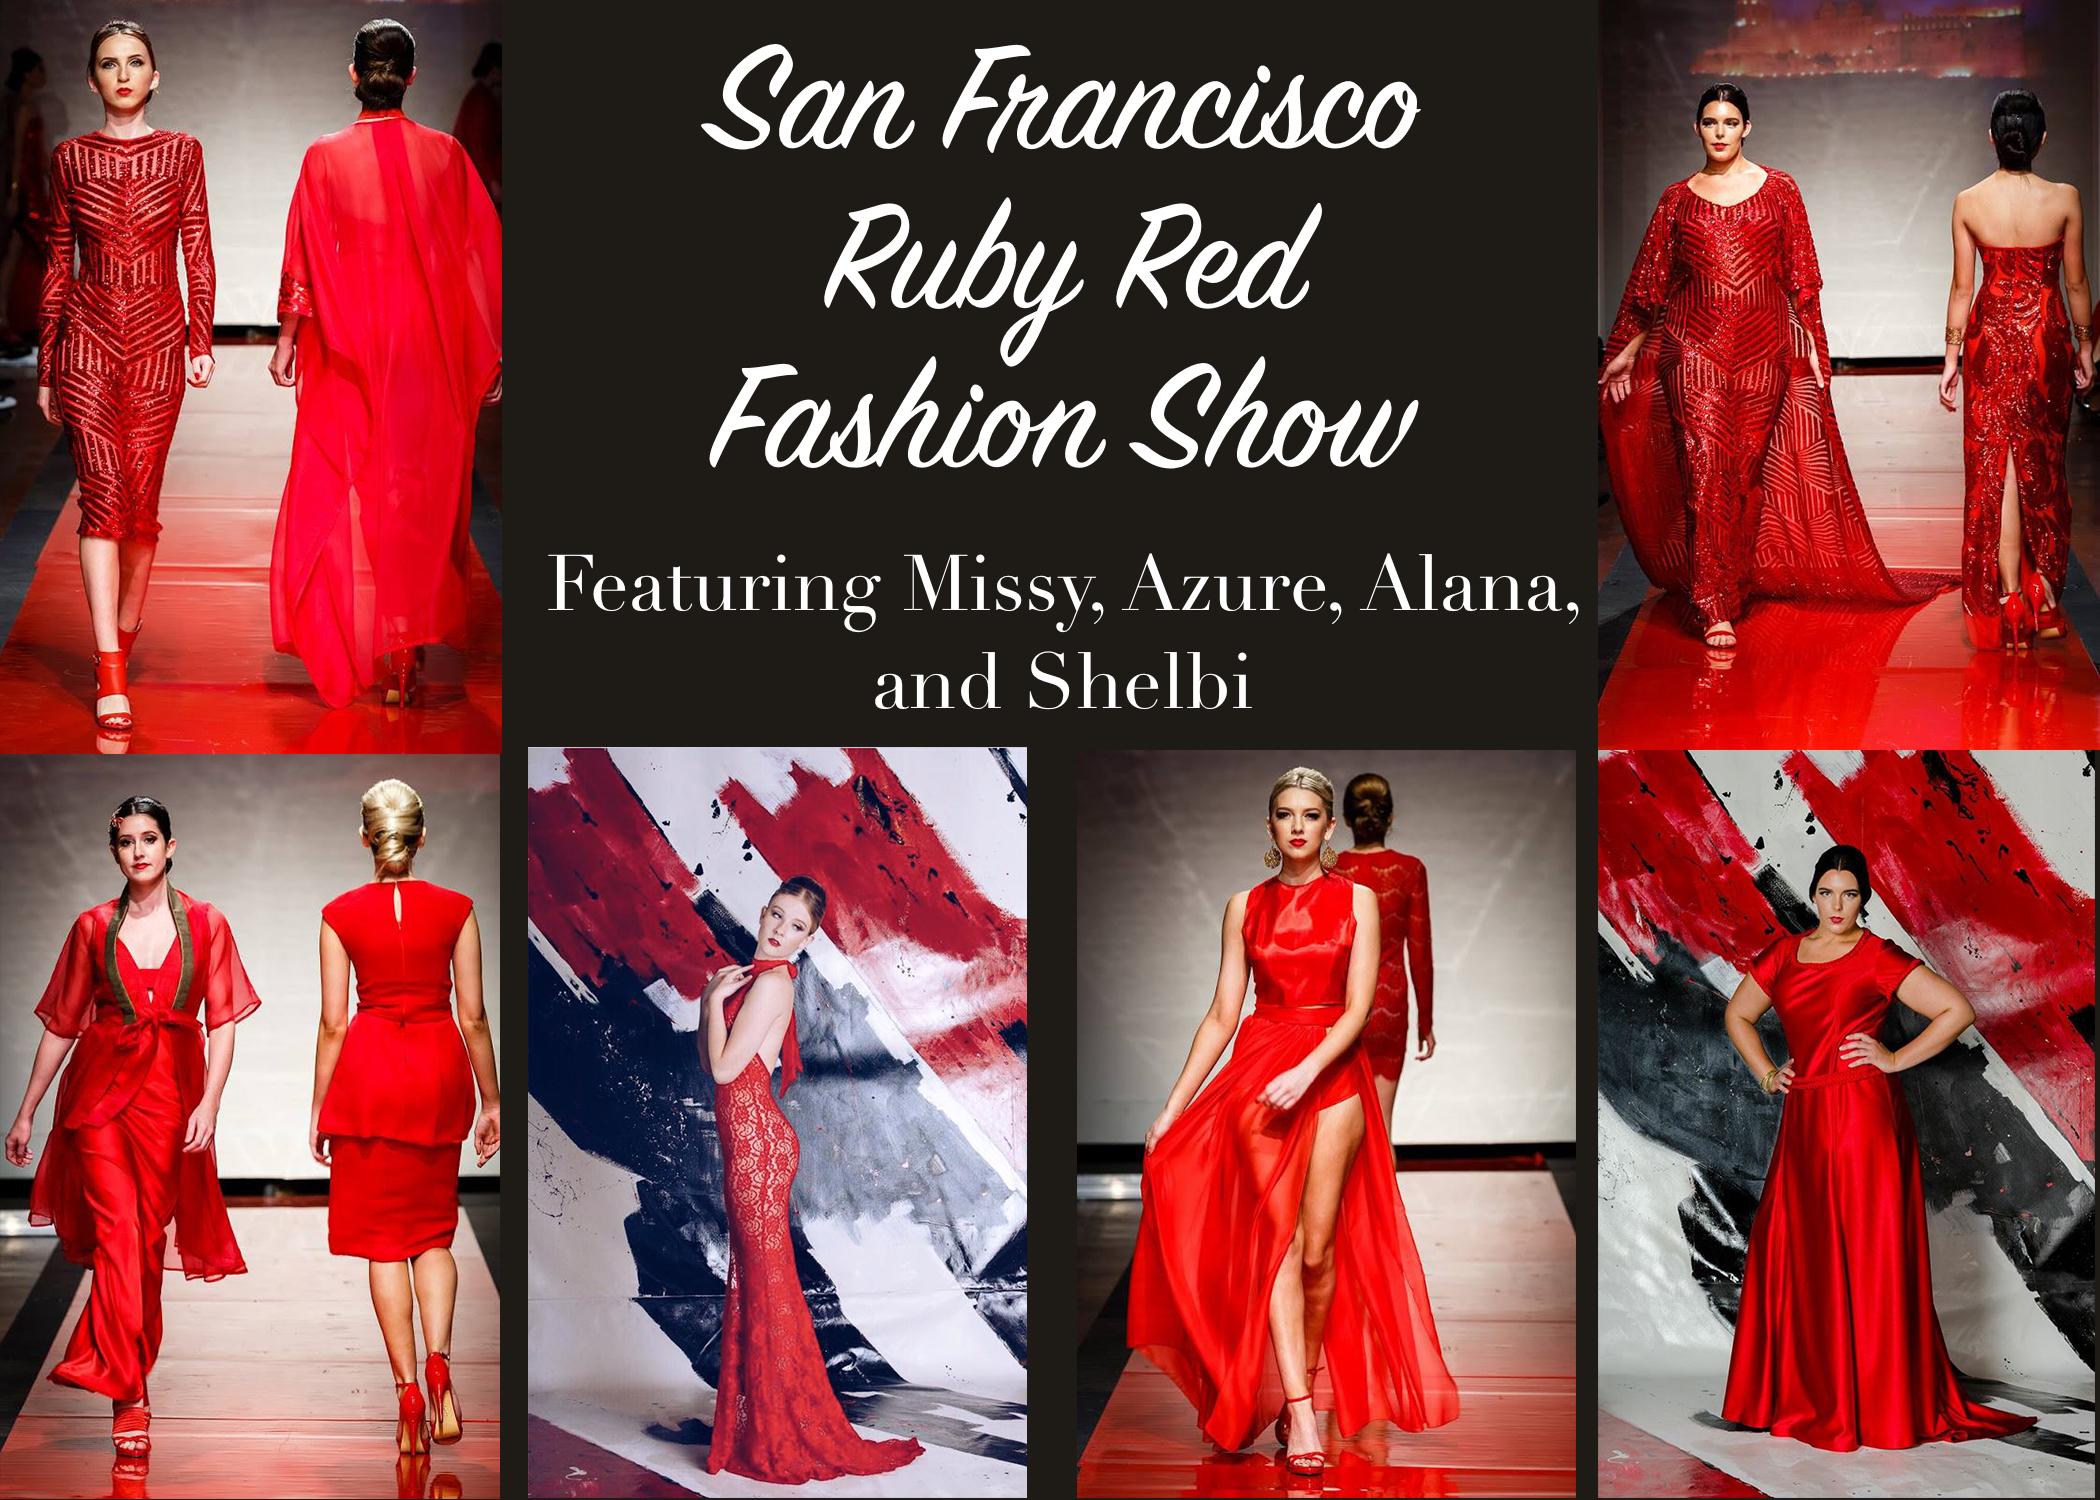 San Francisco Ruby Red Fashion Show